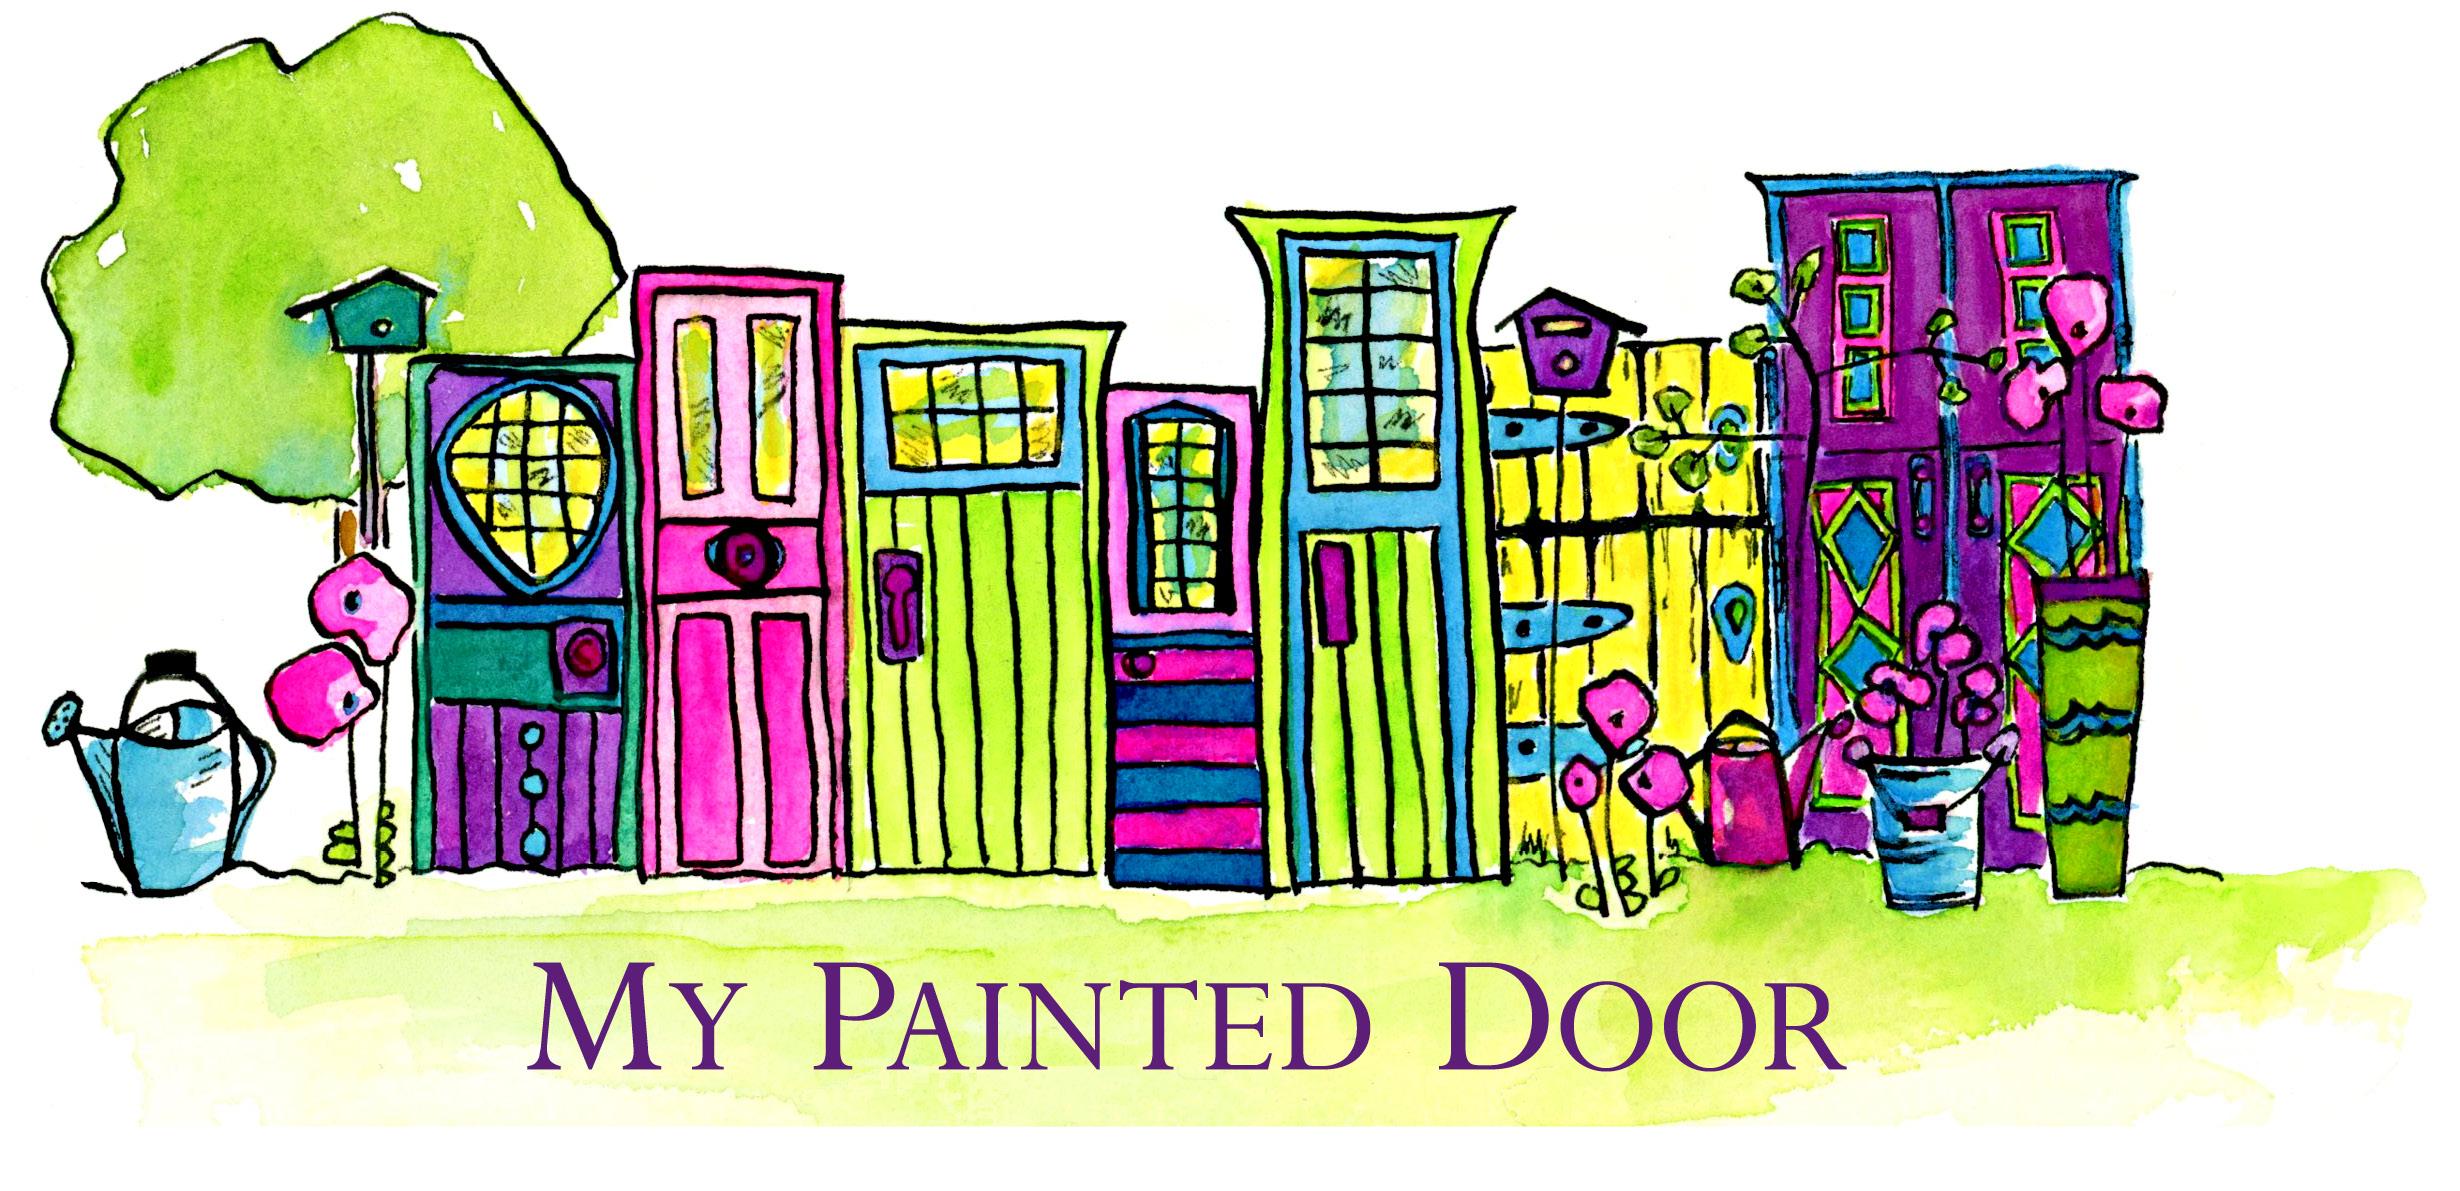 Amara Interior Blog Awards - My Painted Door has been nominated!